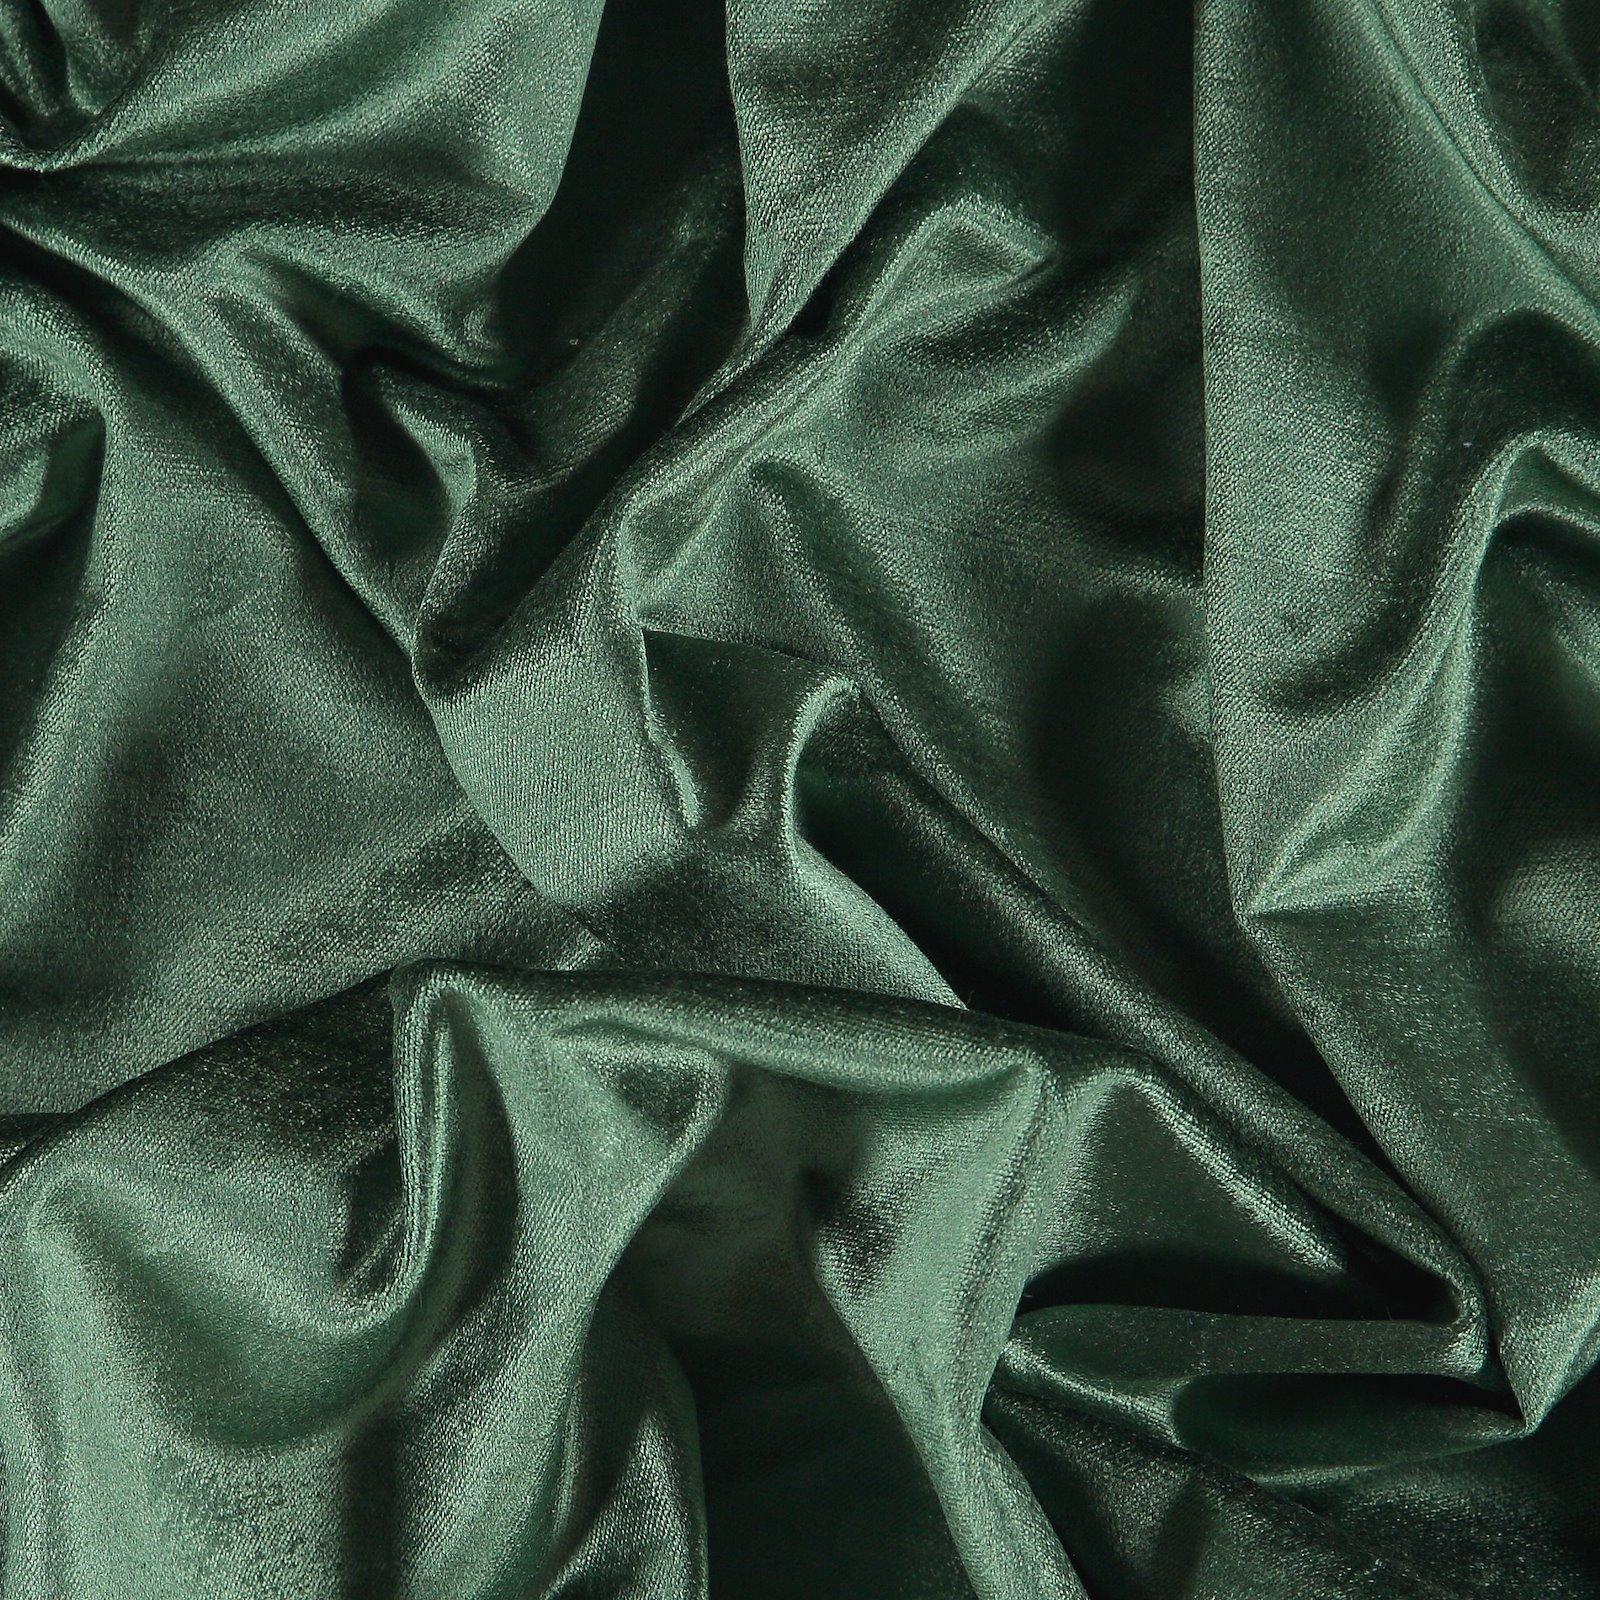 Nicki glänzend mit Struktur, Mintgrün